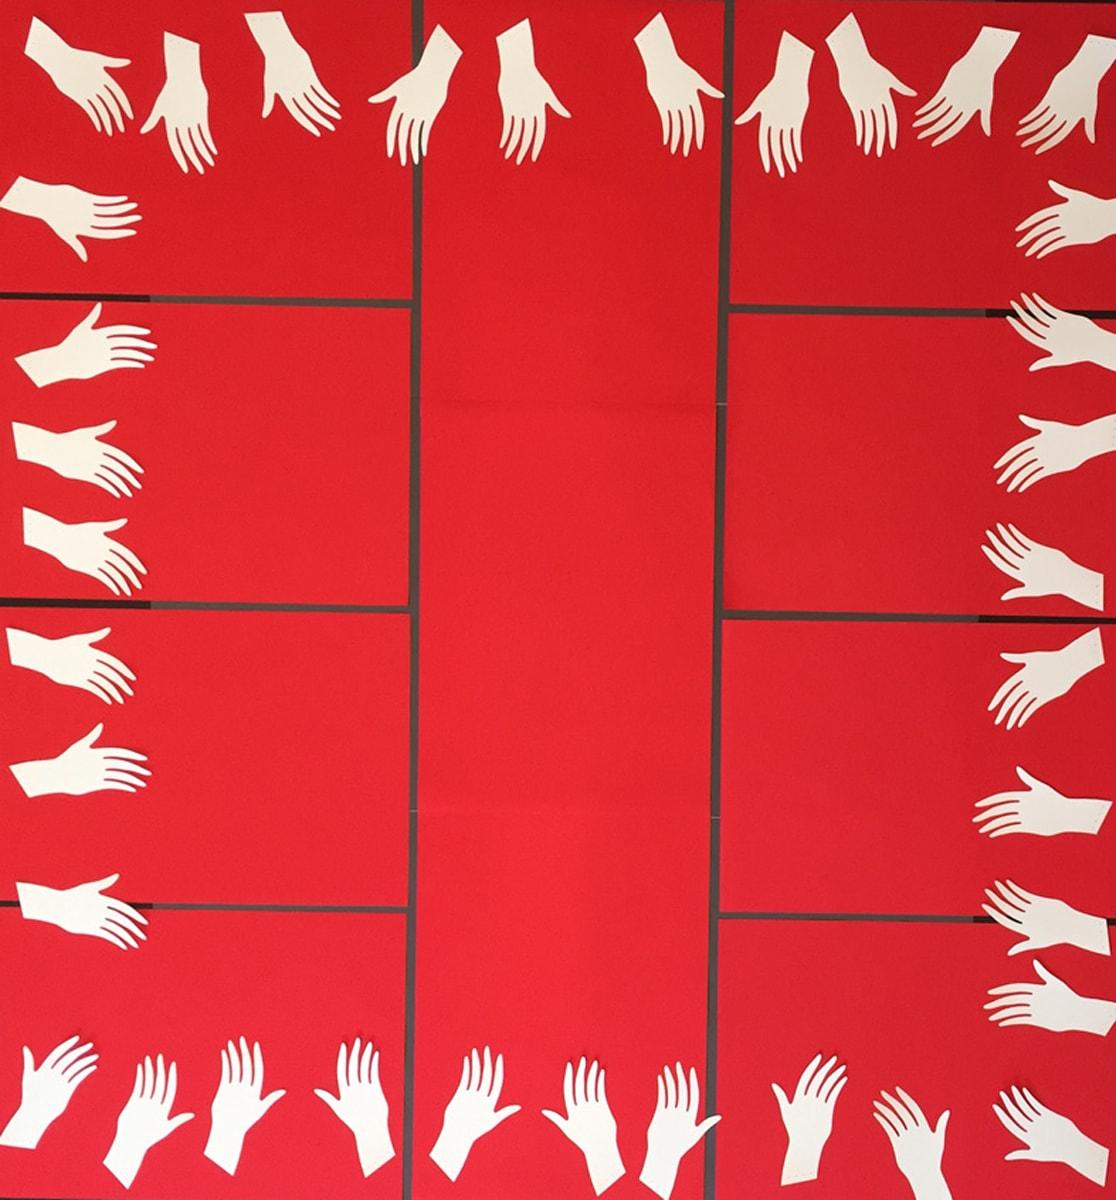 Carpet study - 200 x 210 cm - 2015